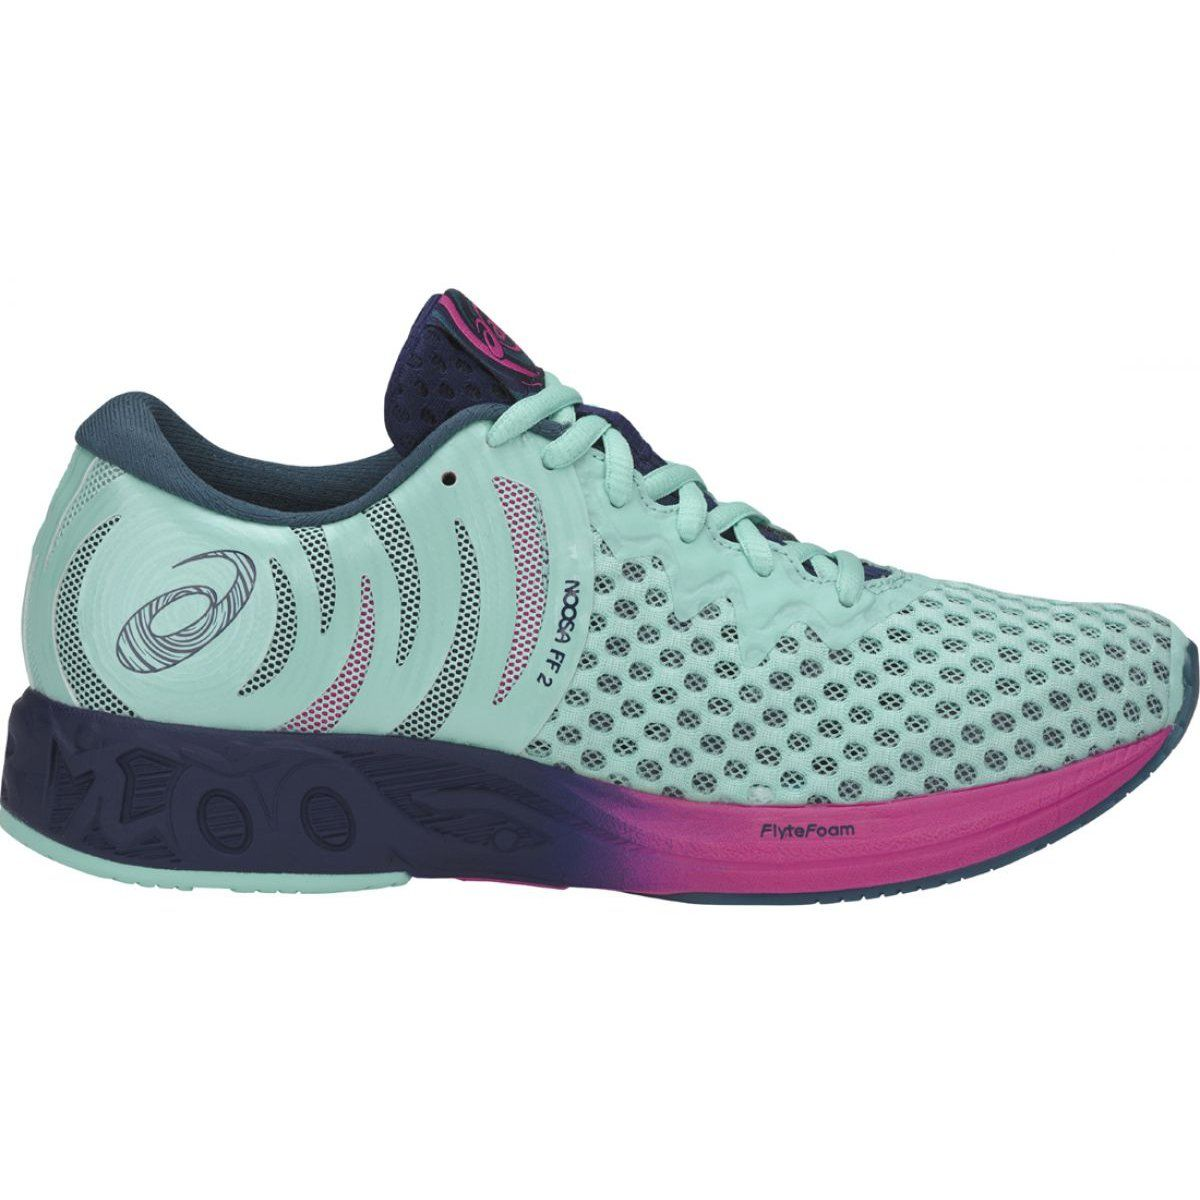 Asics Gel-Noosa Ff 2 W T869N-8849 running shoes | Asics gel ...